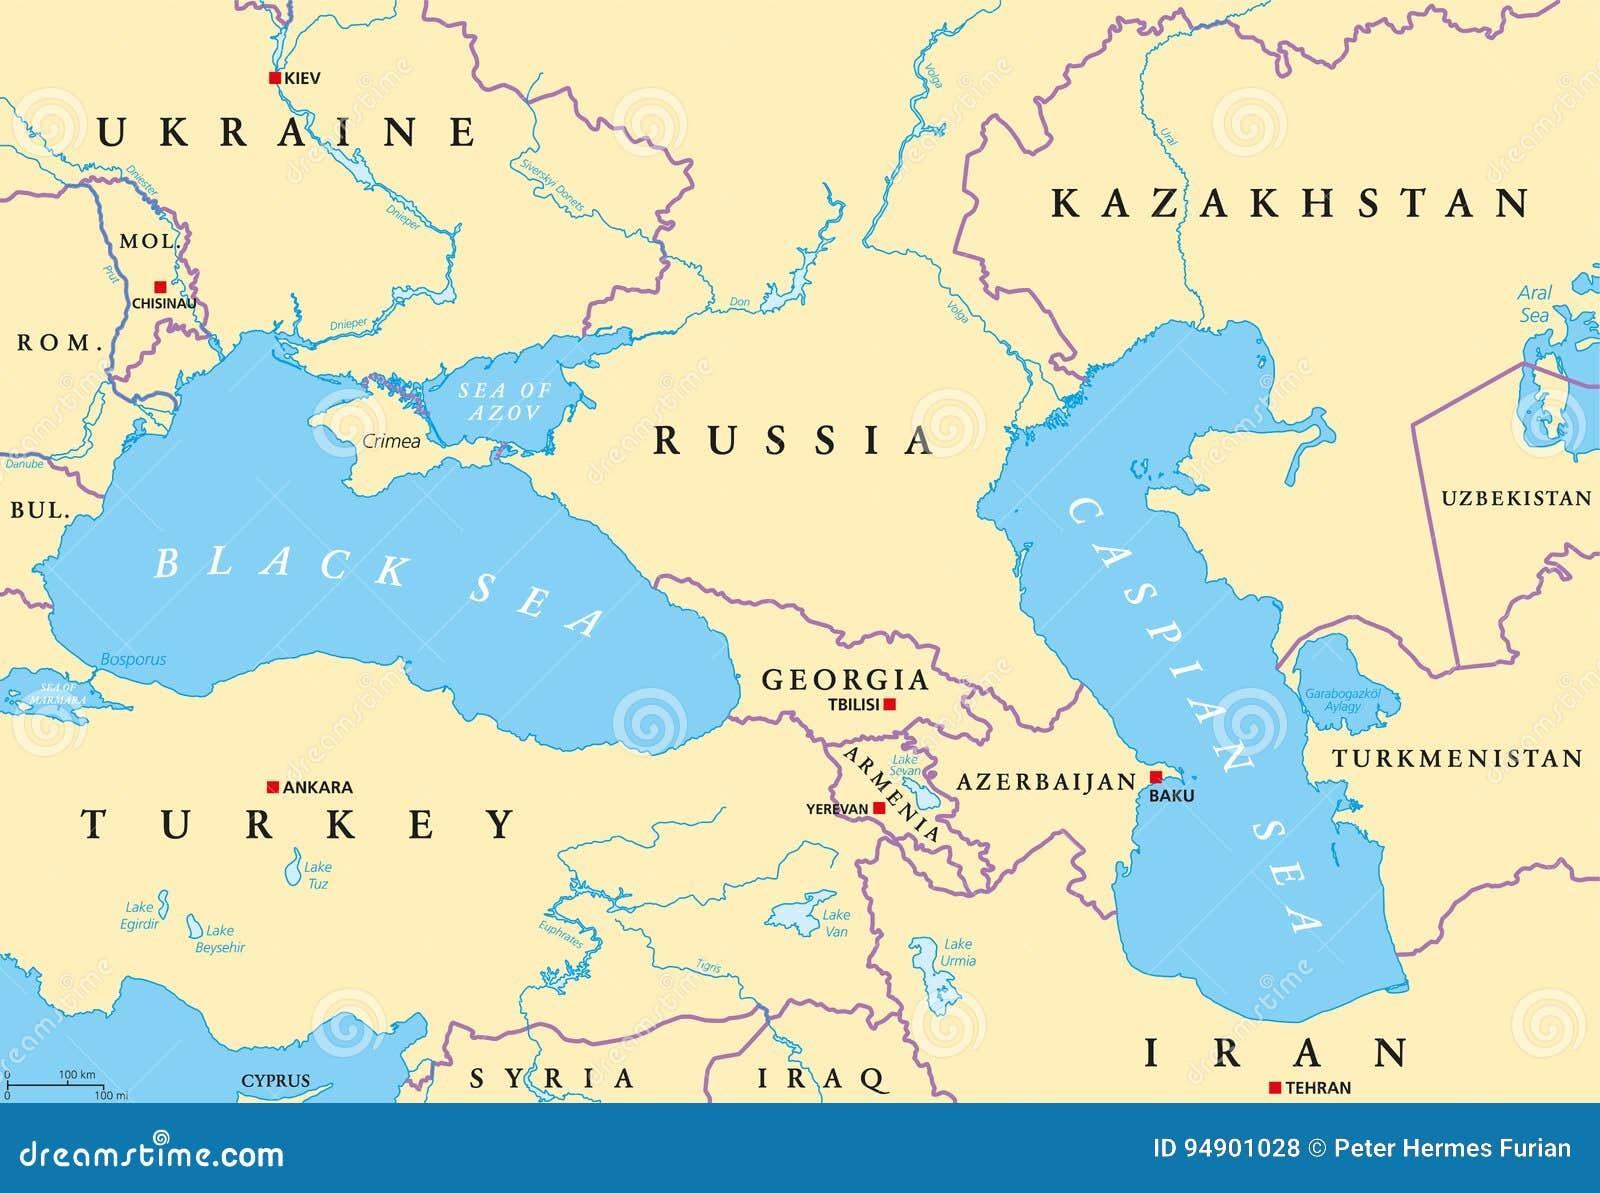 Black Sea And Caspian Sea Region Political Map Stock Vector